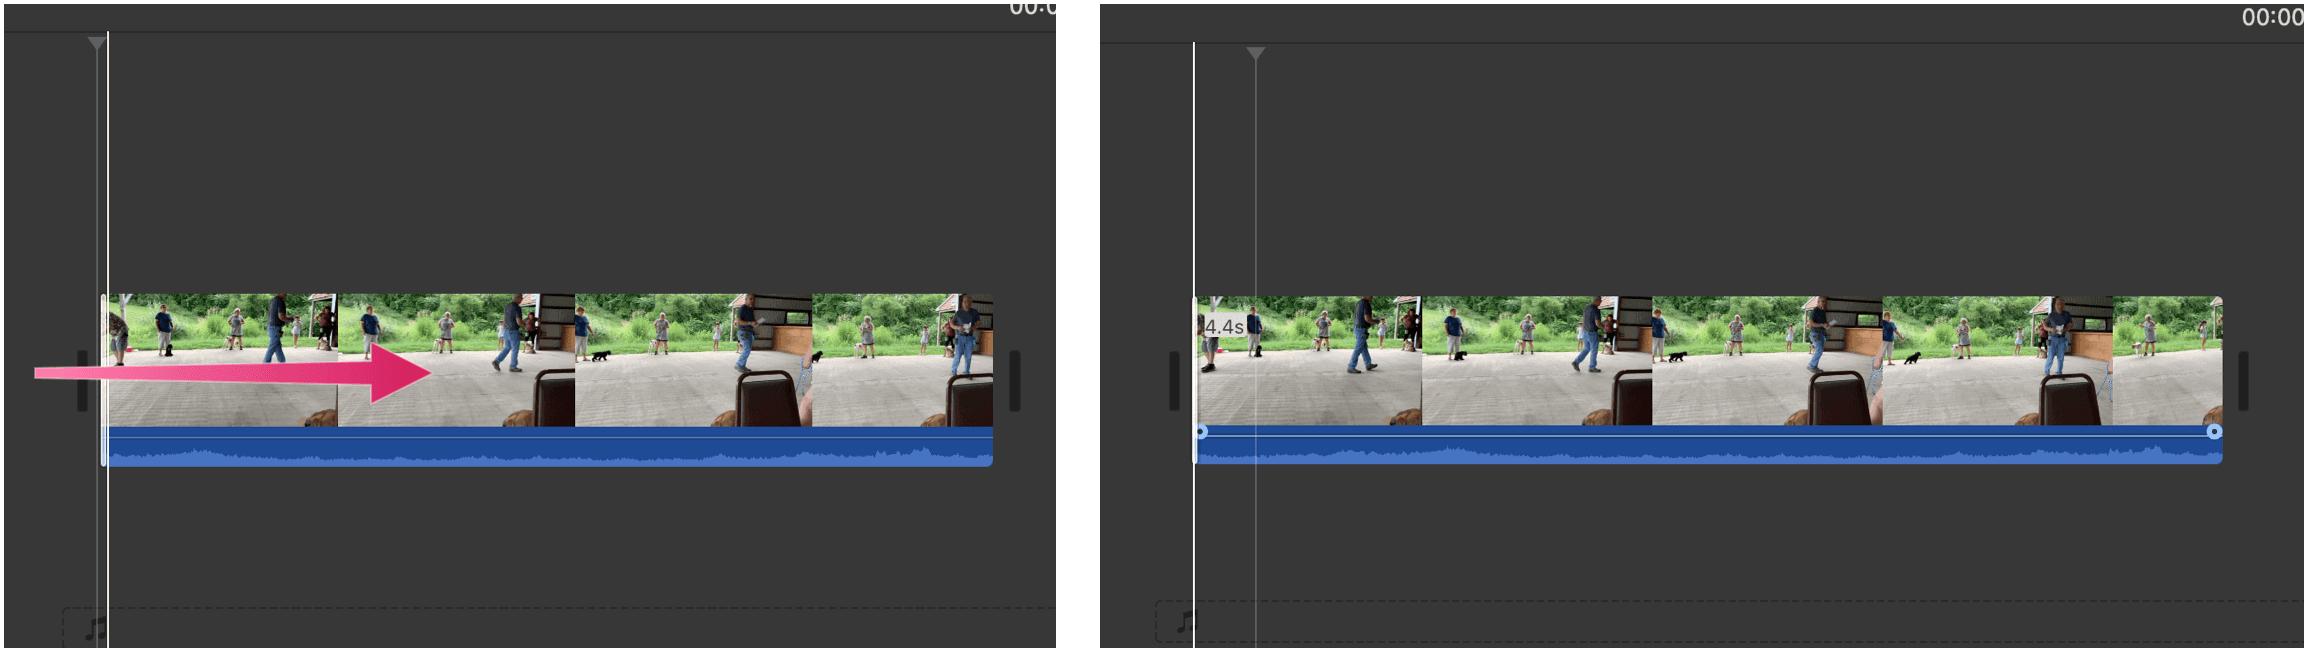 iMovie edit clip